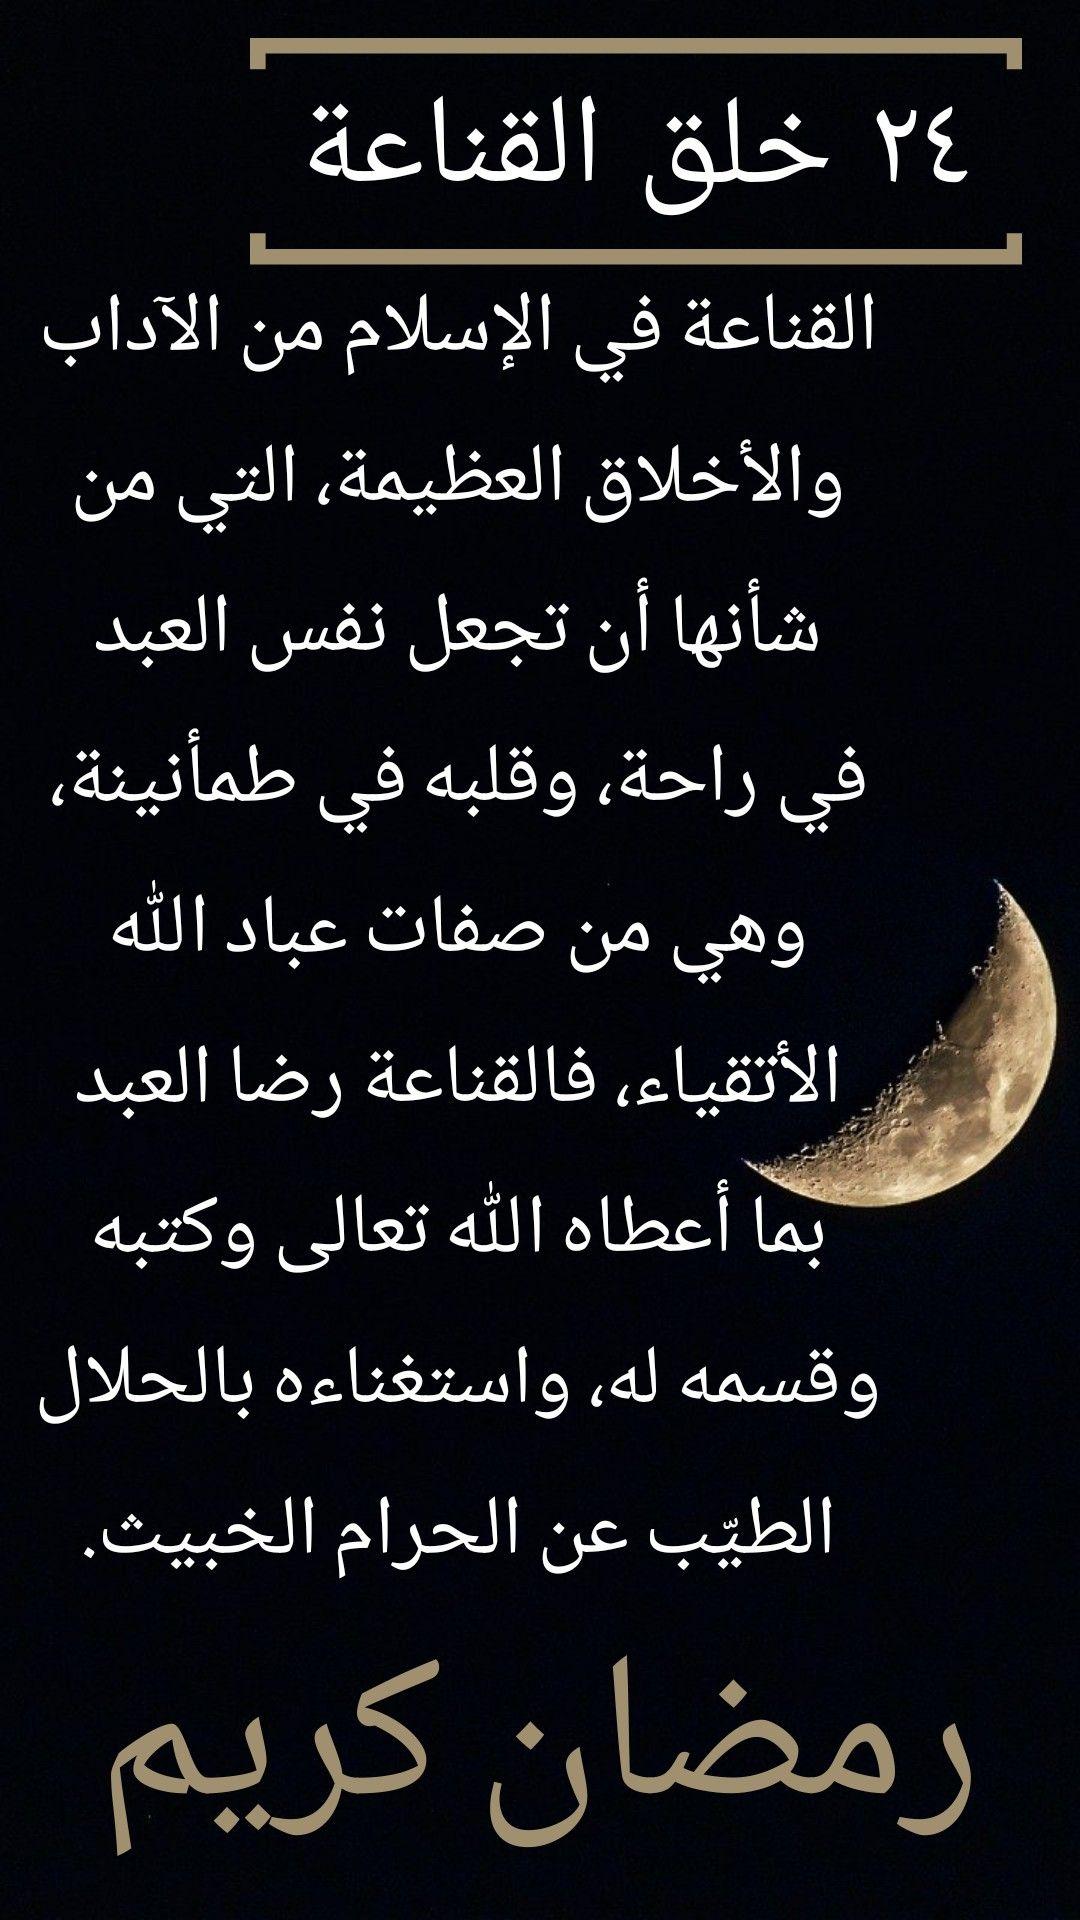 القناعة Movie Posters Calligraphy Arabic Calligraphy